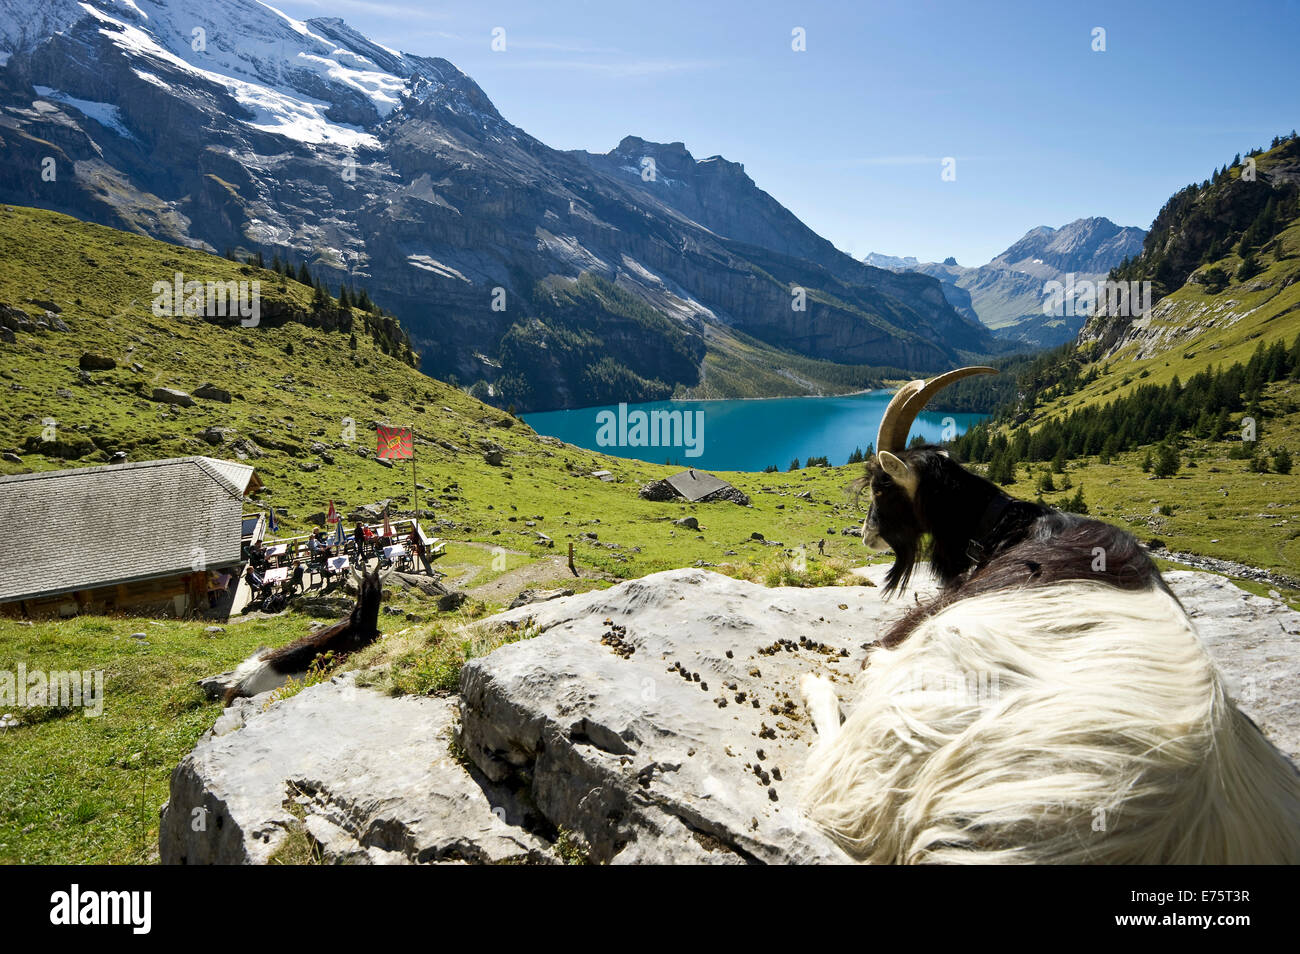 Goat and a mountain inn, Oeschinensee Lake, Kandersteg, Bernese Oberland, Canton Bern, Switzerland - Stock Image